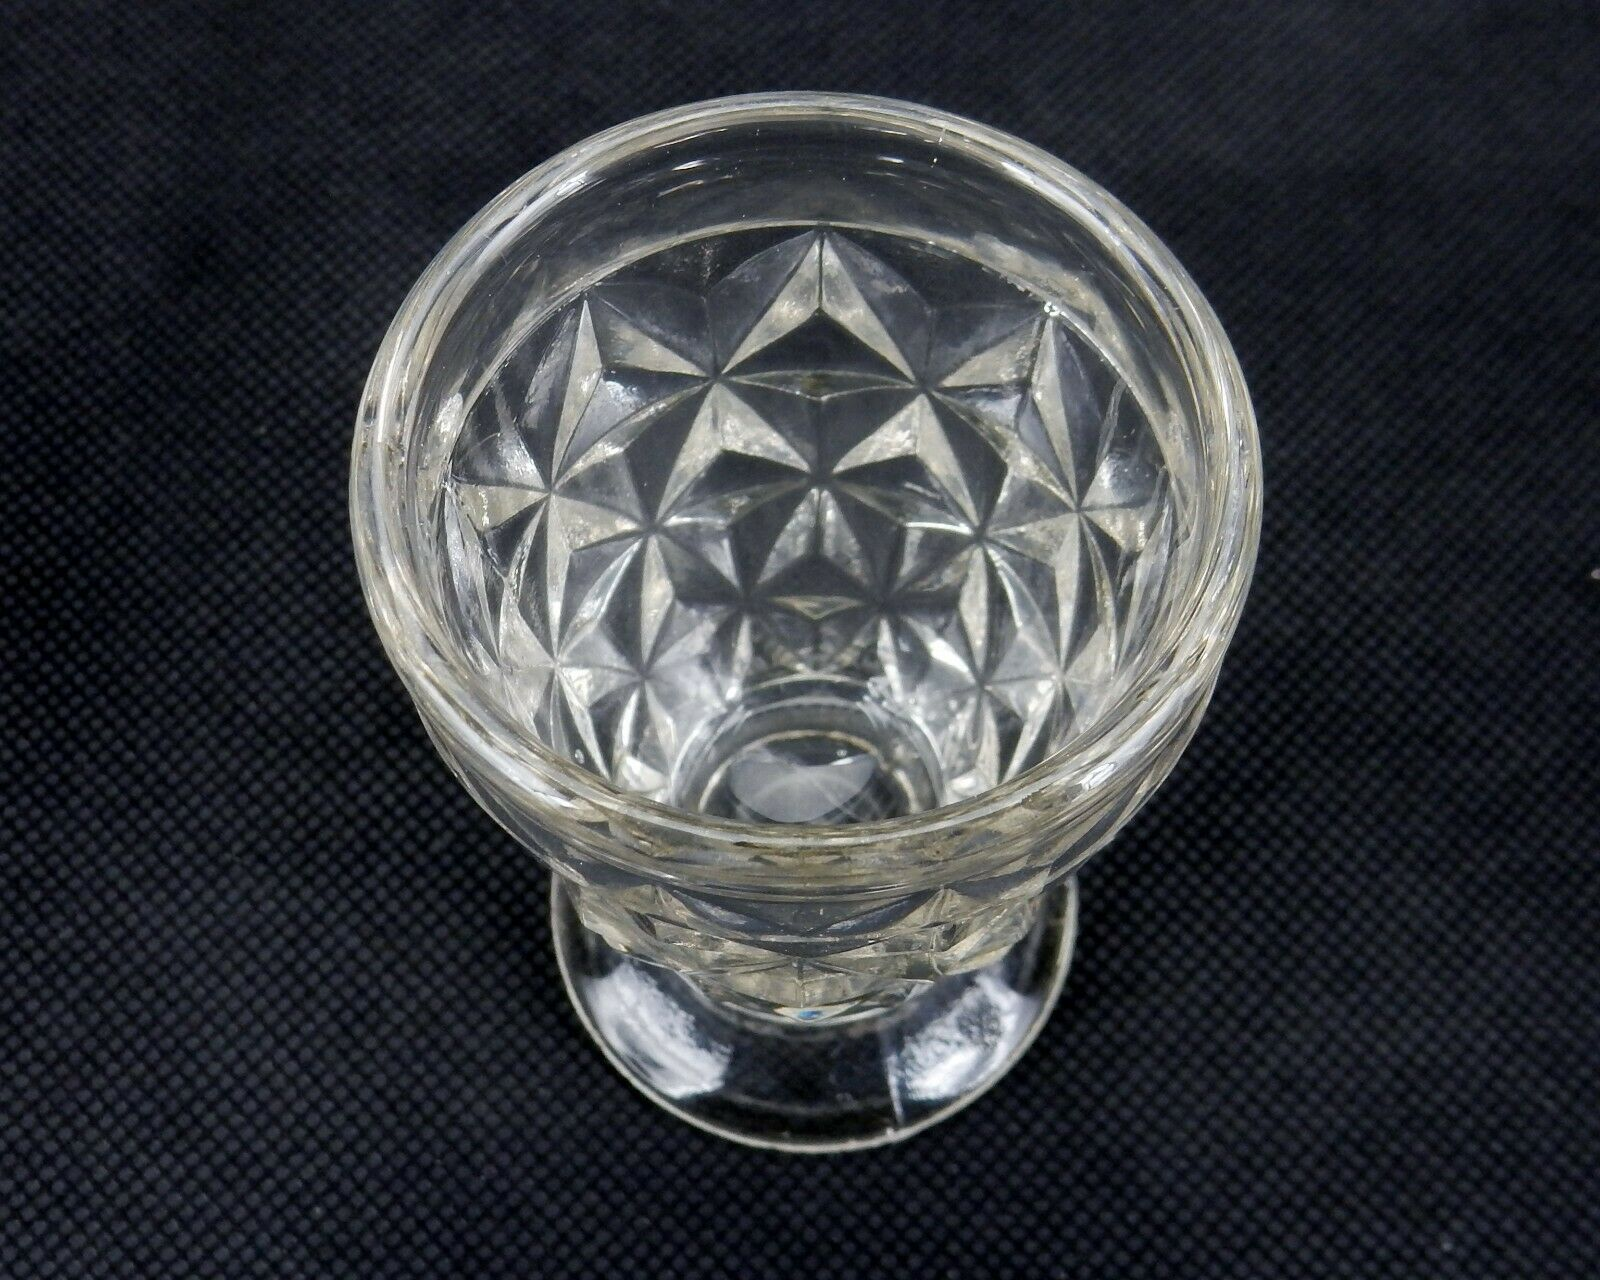 Barrel Shaped Vintage Toothpick Holder Clear Cut Glass Star Pattern